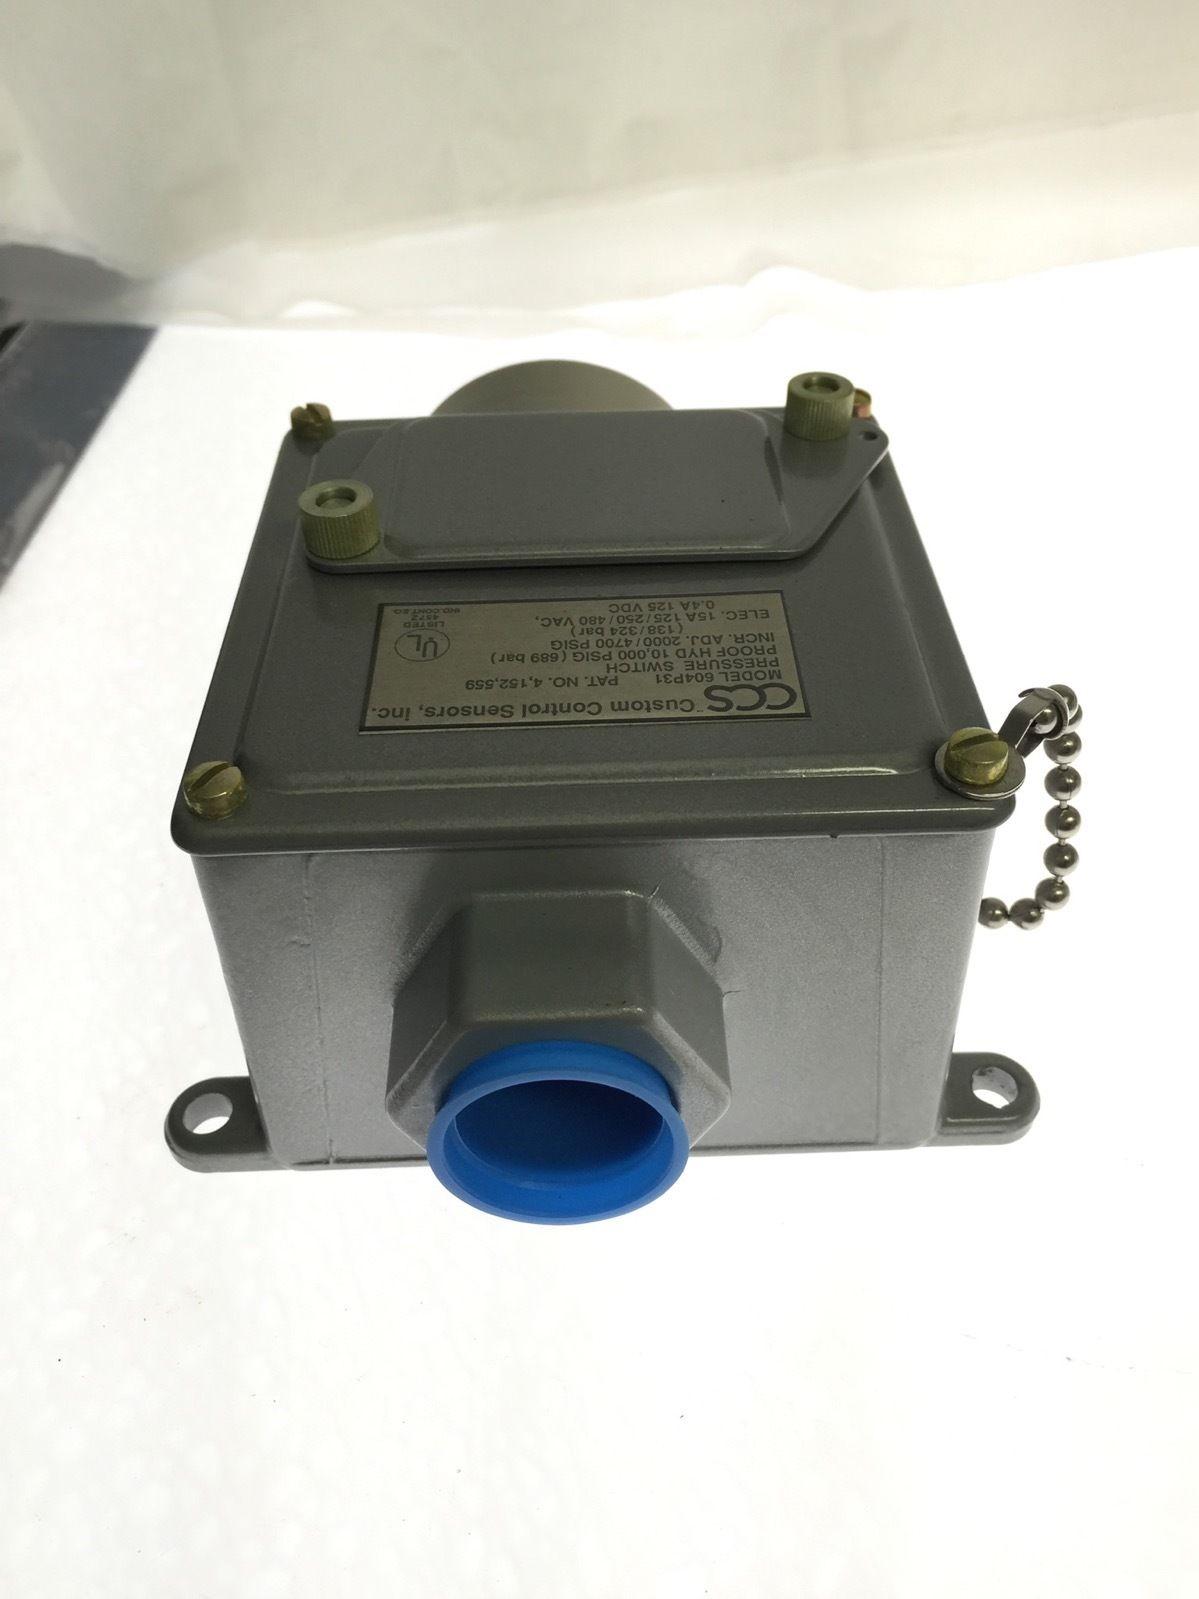 CUSTOM CONTROL SENSORS 604P31 2000/4700 PSIG 15A PRESSURE SWITCH NEW IN BOX H89 2